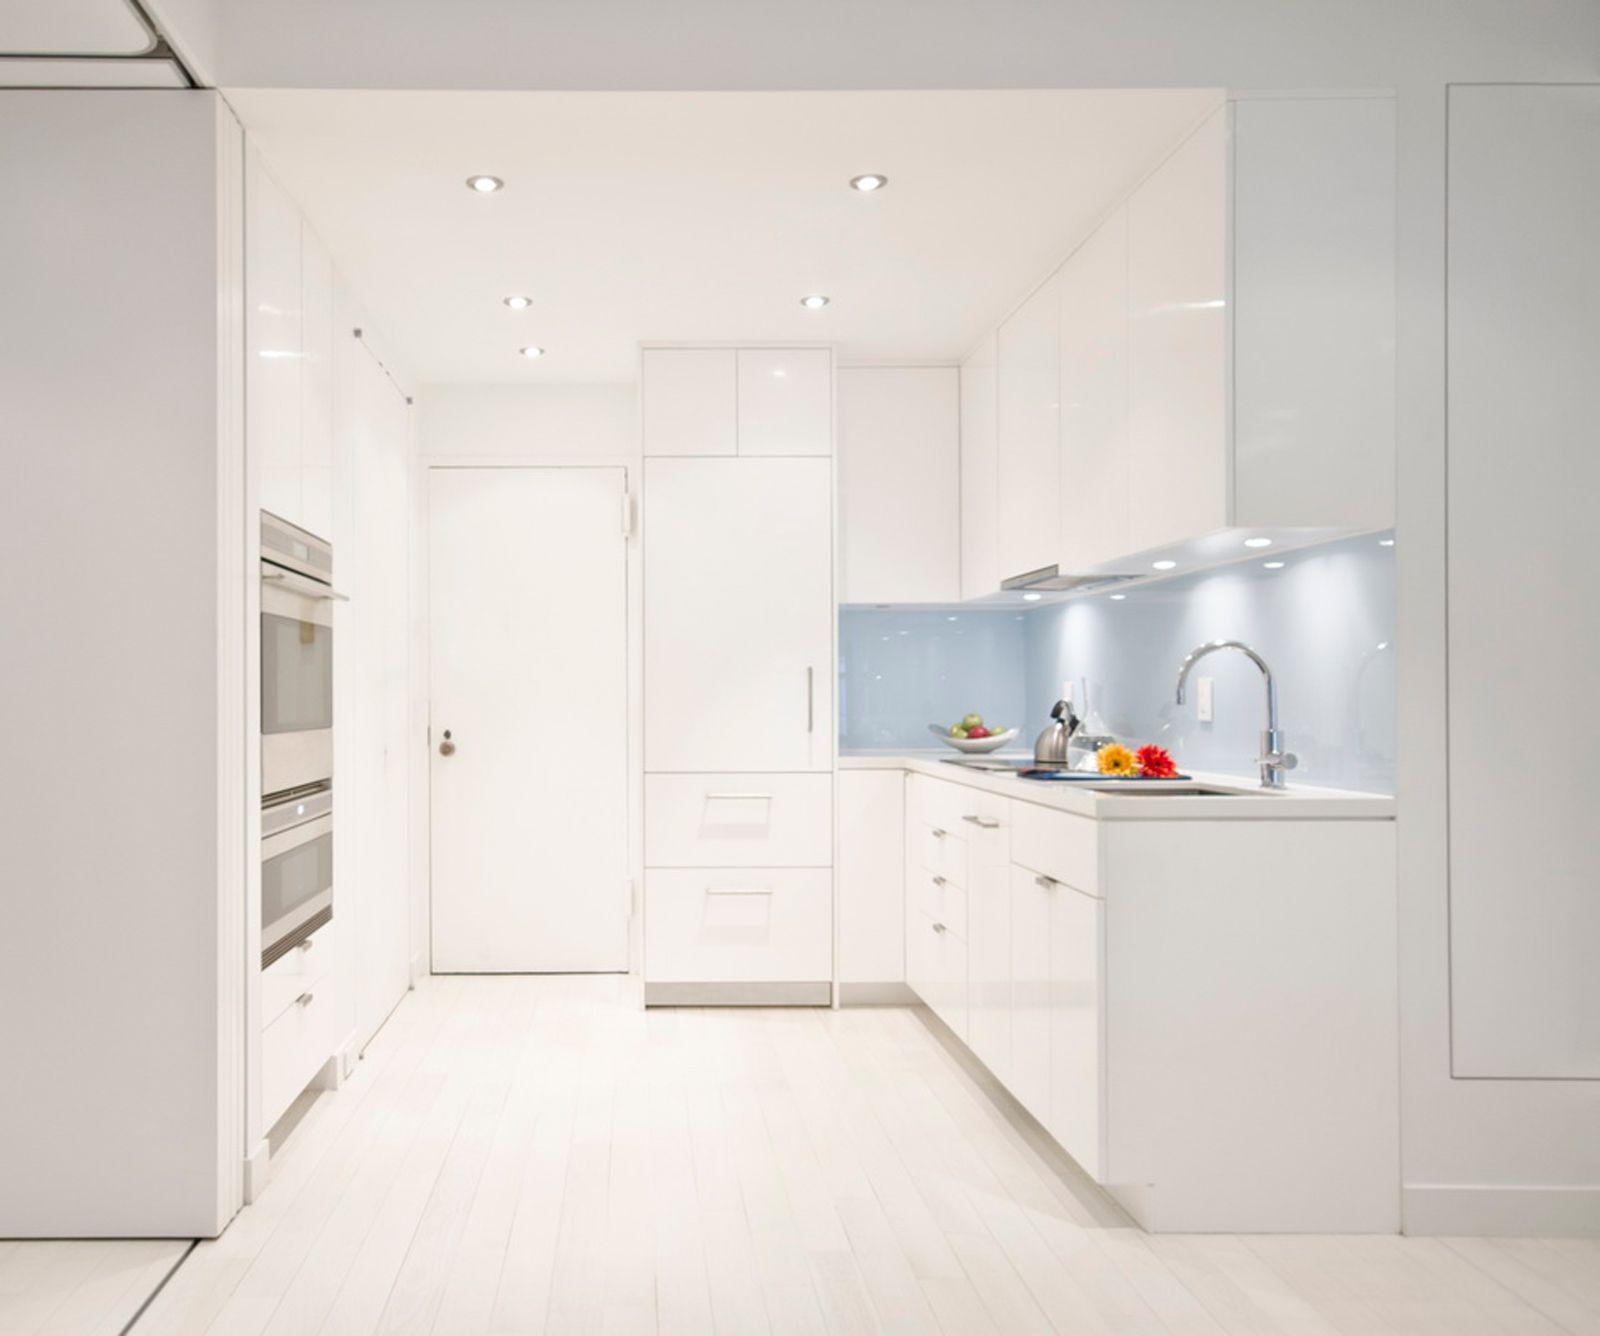 Slideshow University Place Apartment Dwell Modern Kitchen Renovation Kitchen Renovation Home